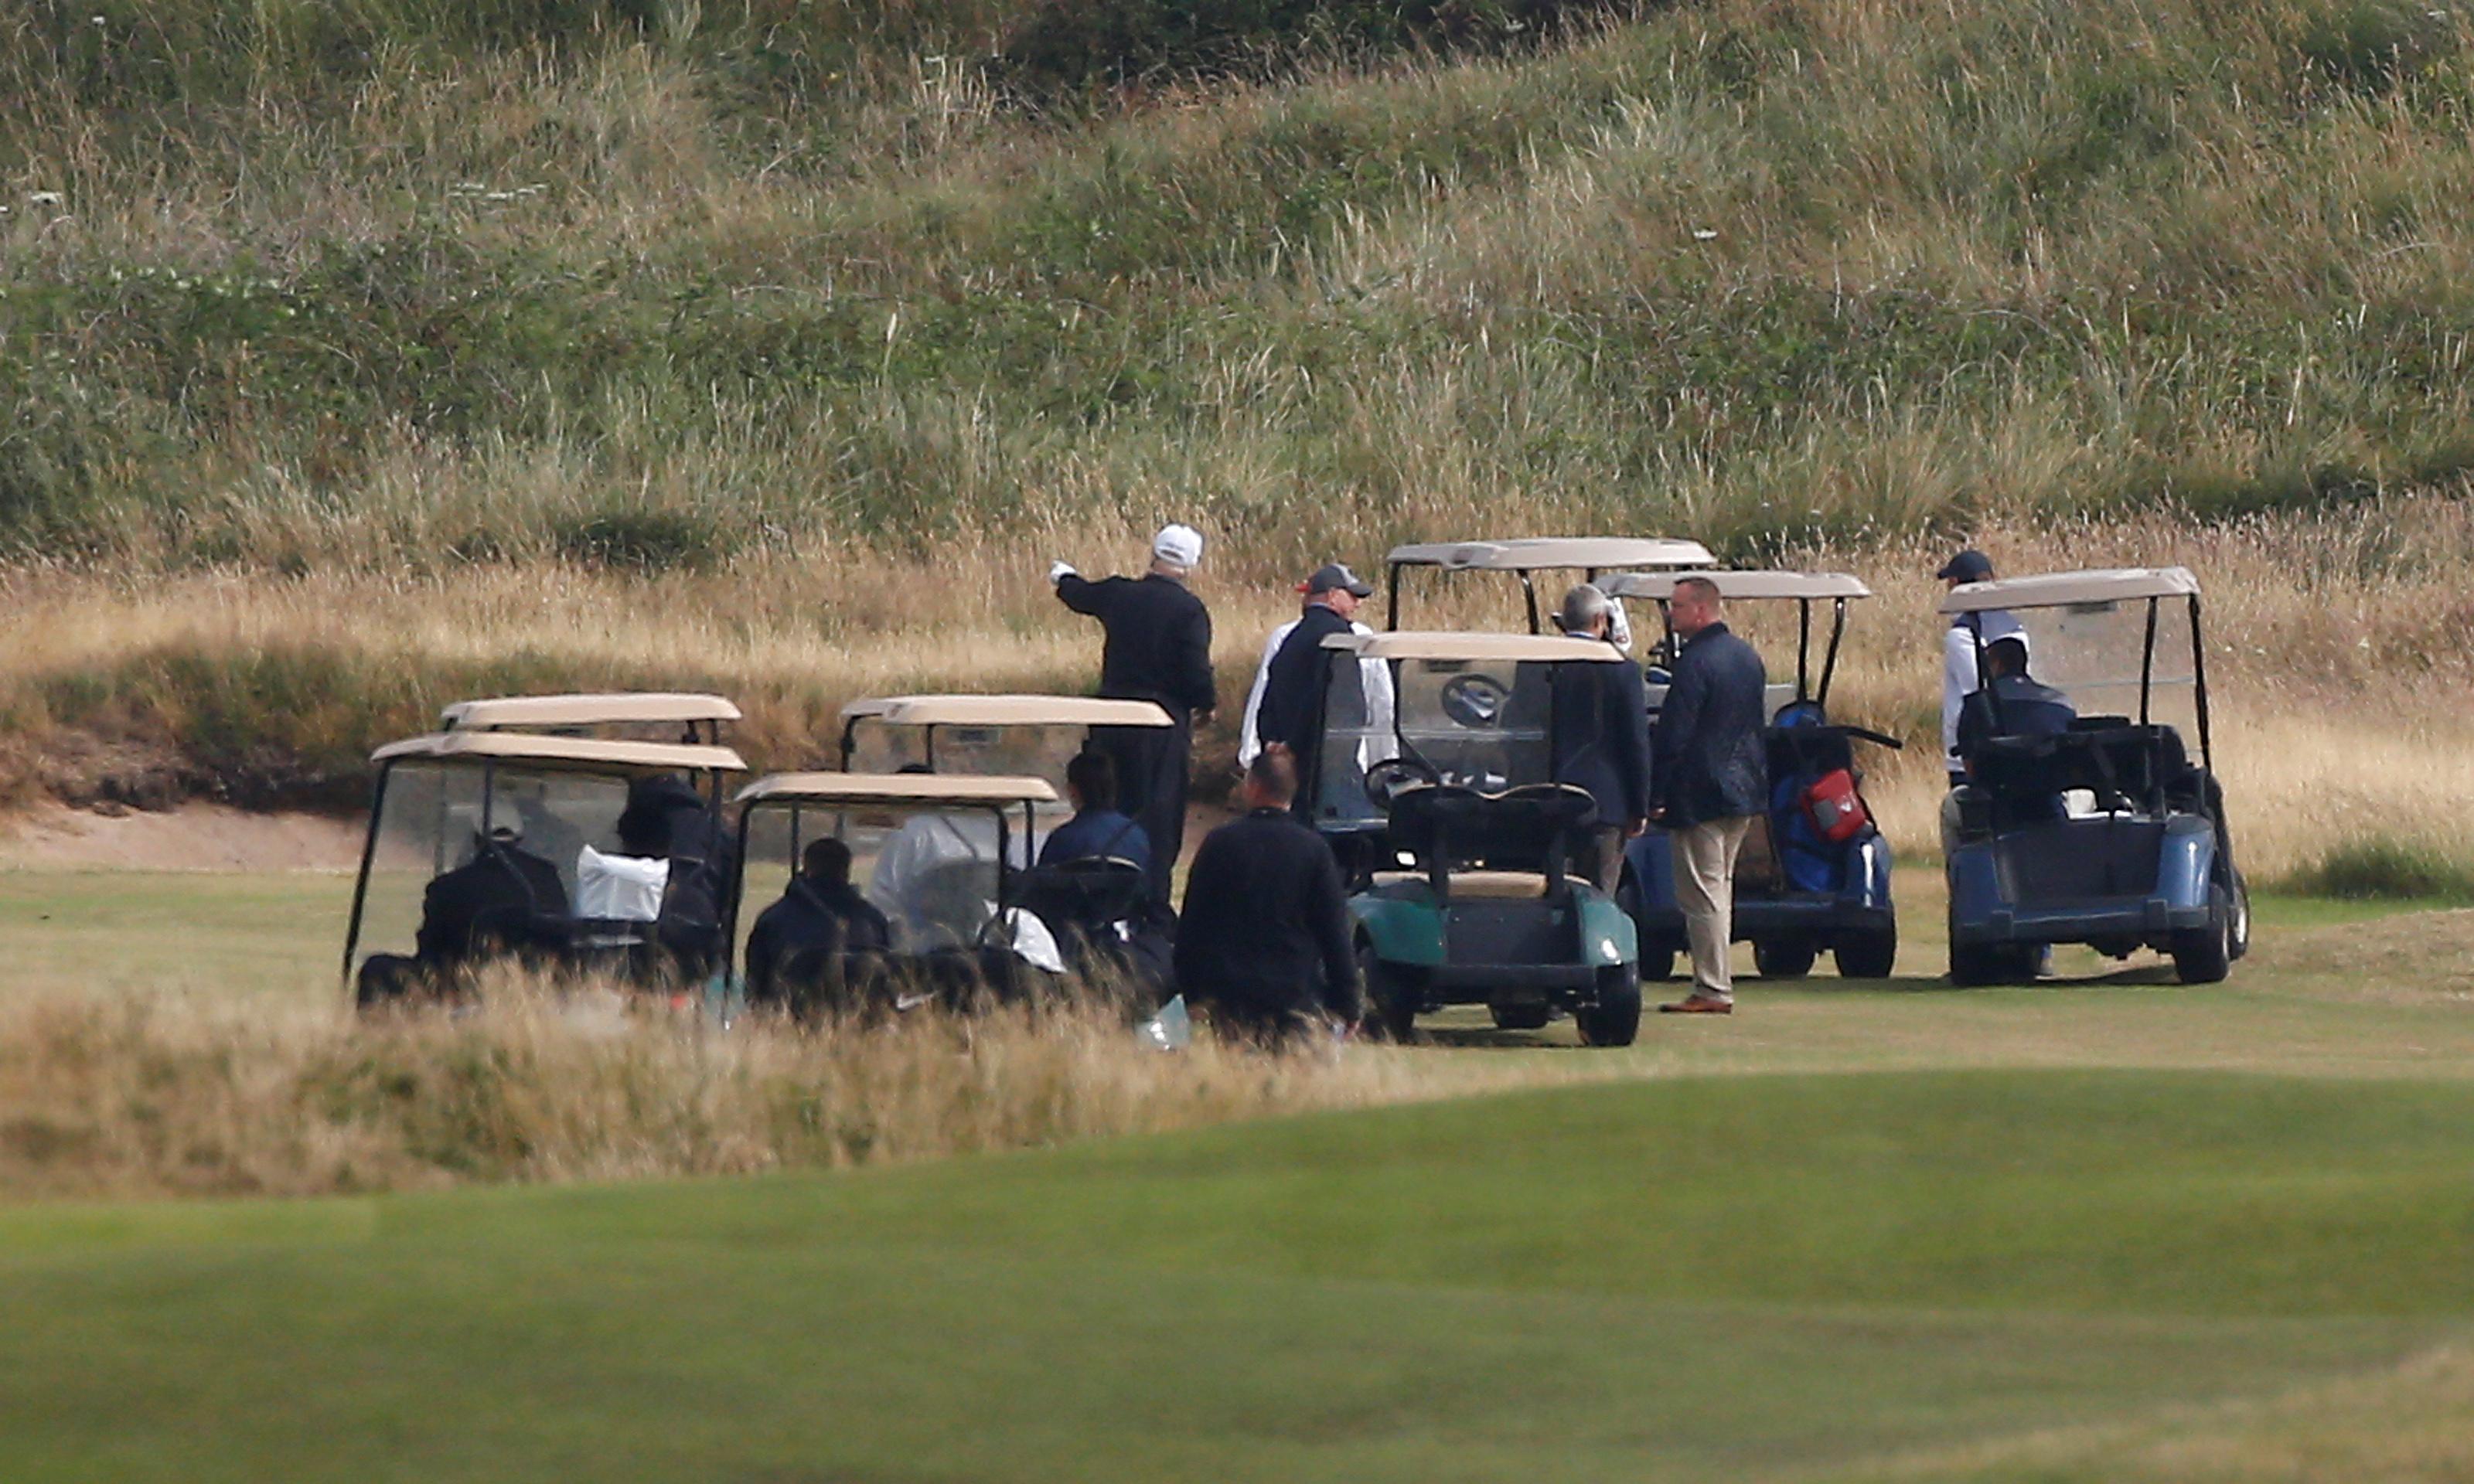 Trumpi Turnberry kuurortis Šotimaal asuv golfikeskus